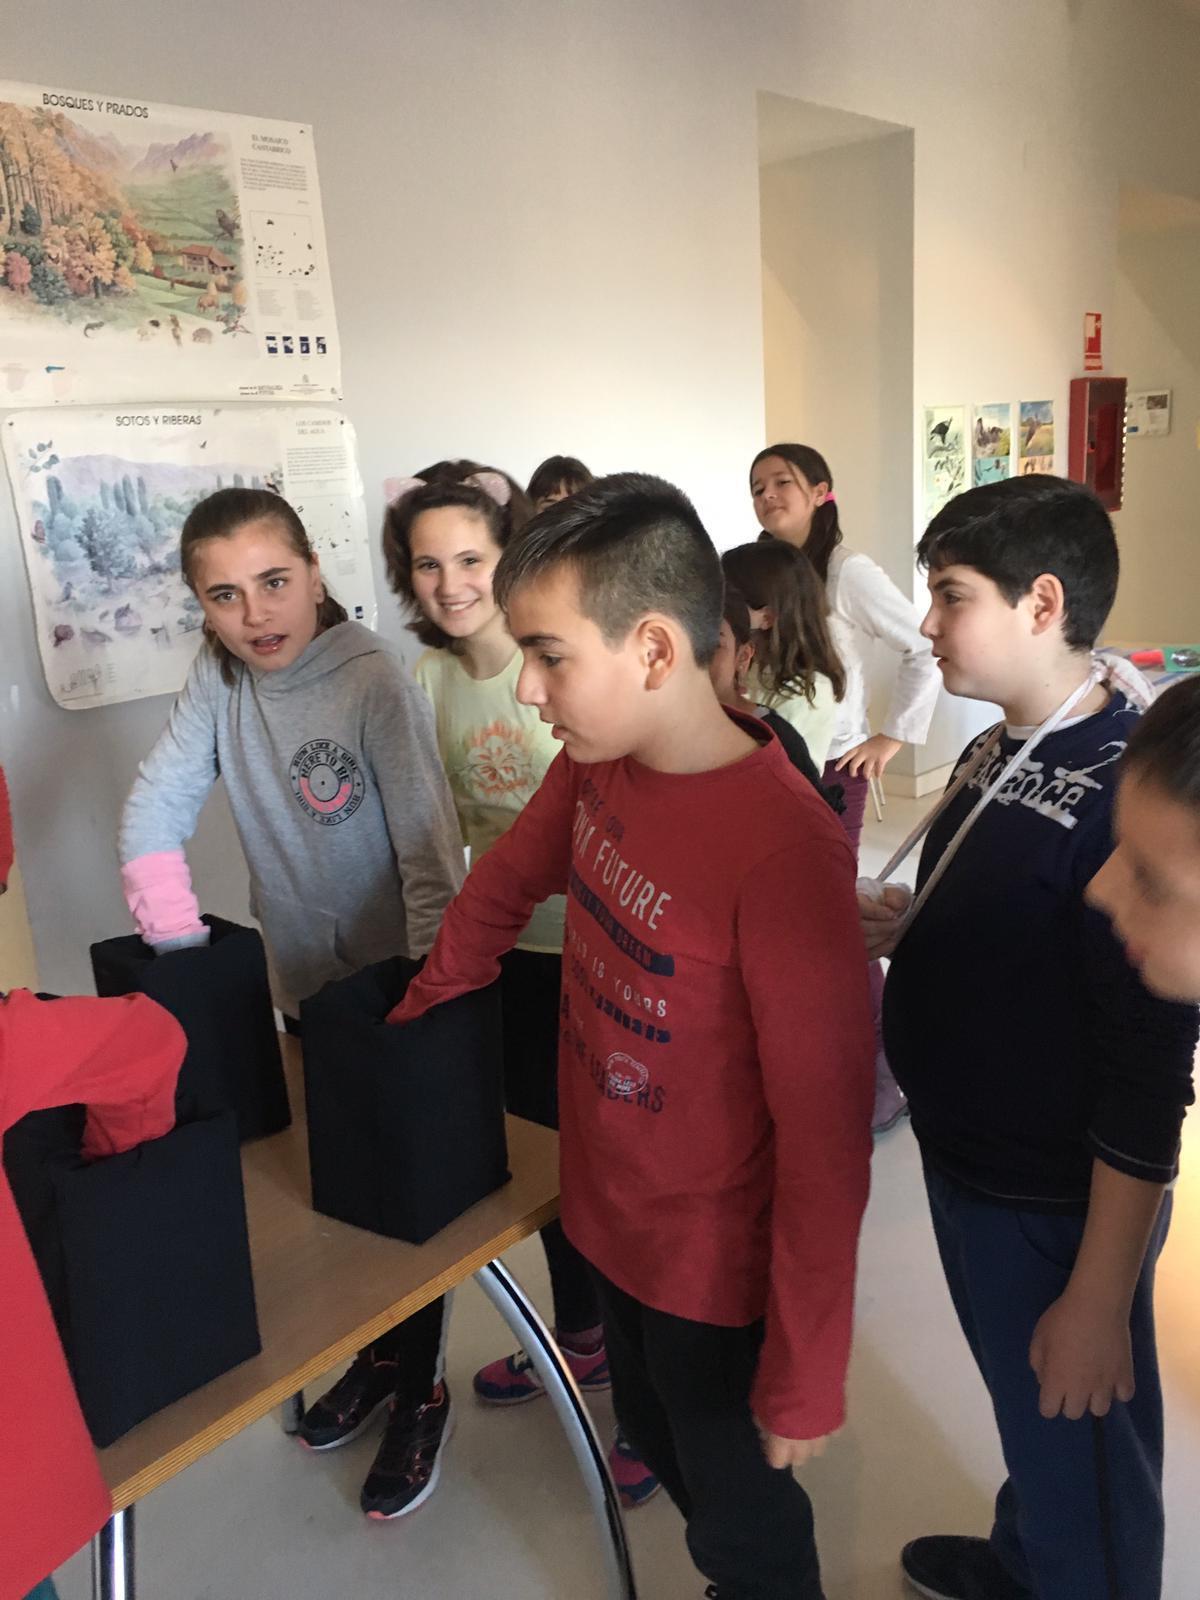 Centro de Interpretación de la Naturaleza. Montecarmelo. 6º curso. 21